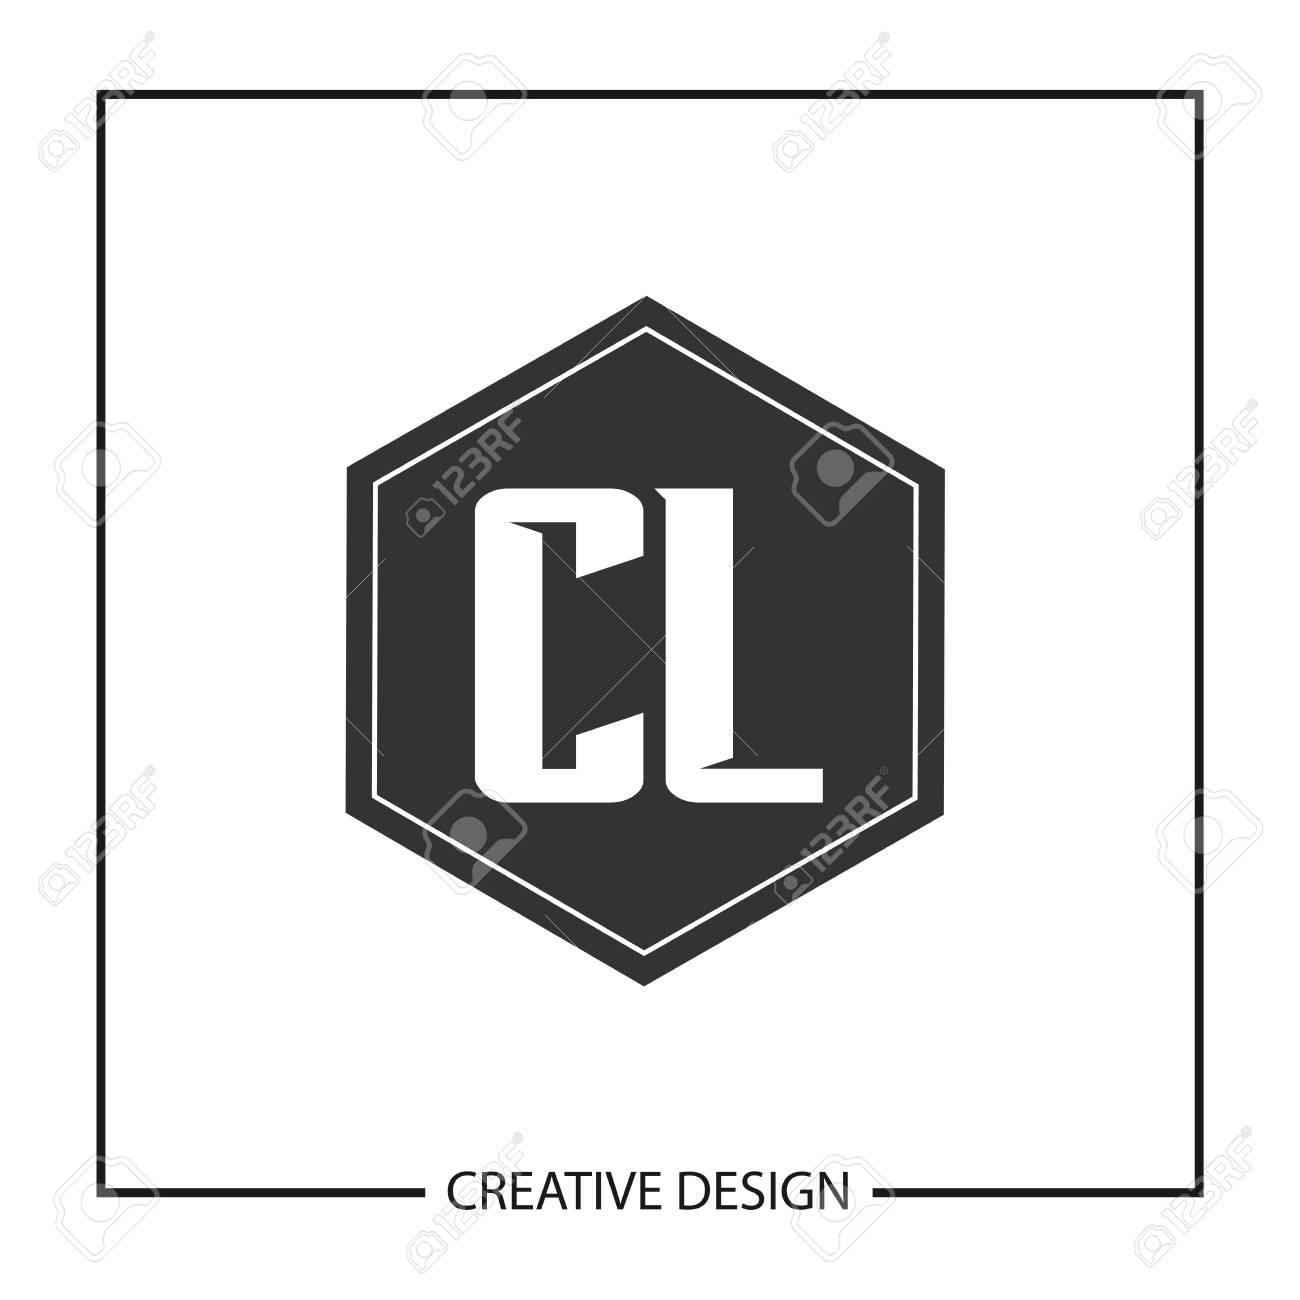 Initial Letter CL Logo Template Design Vector Illustration - 113872392